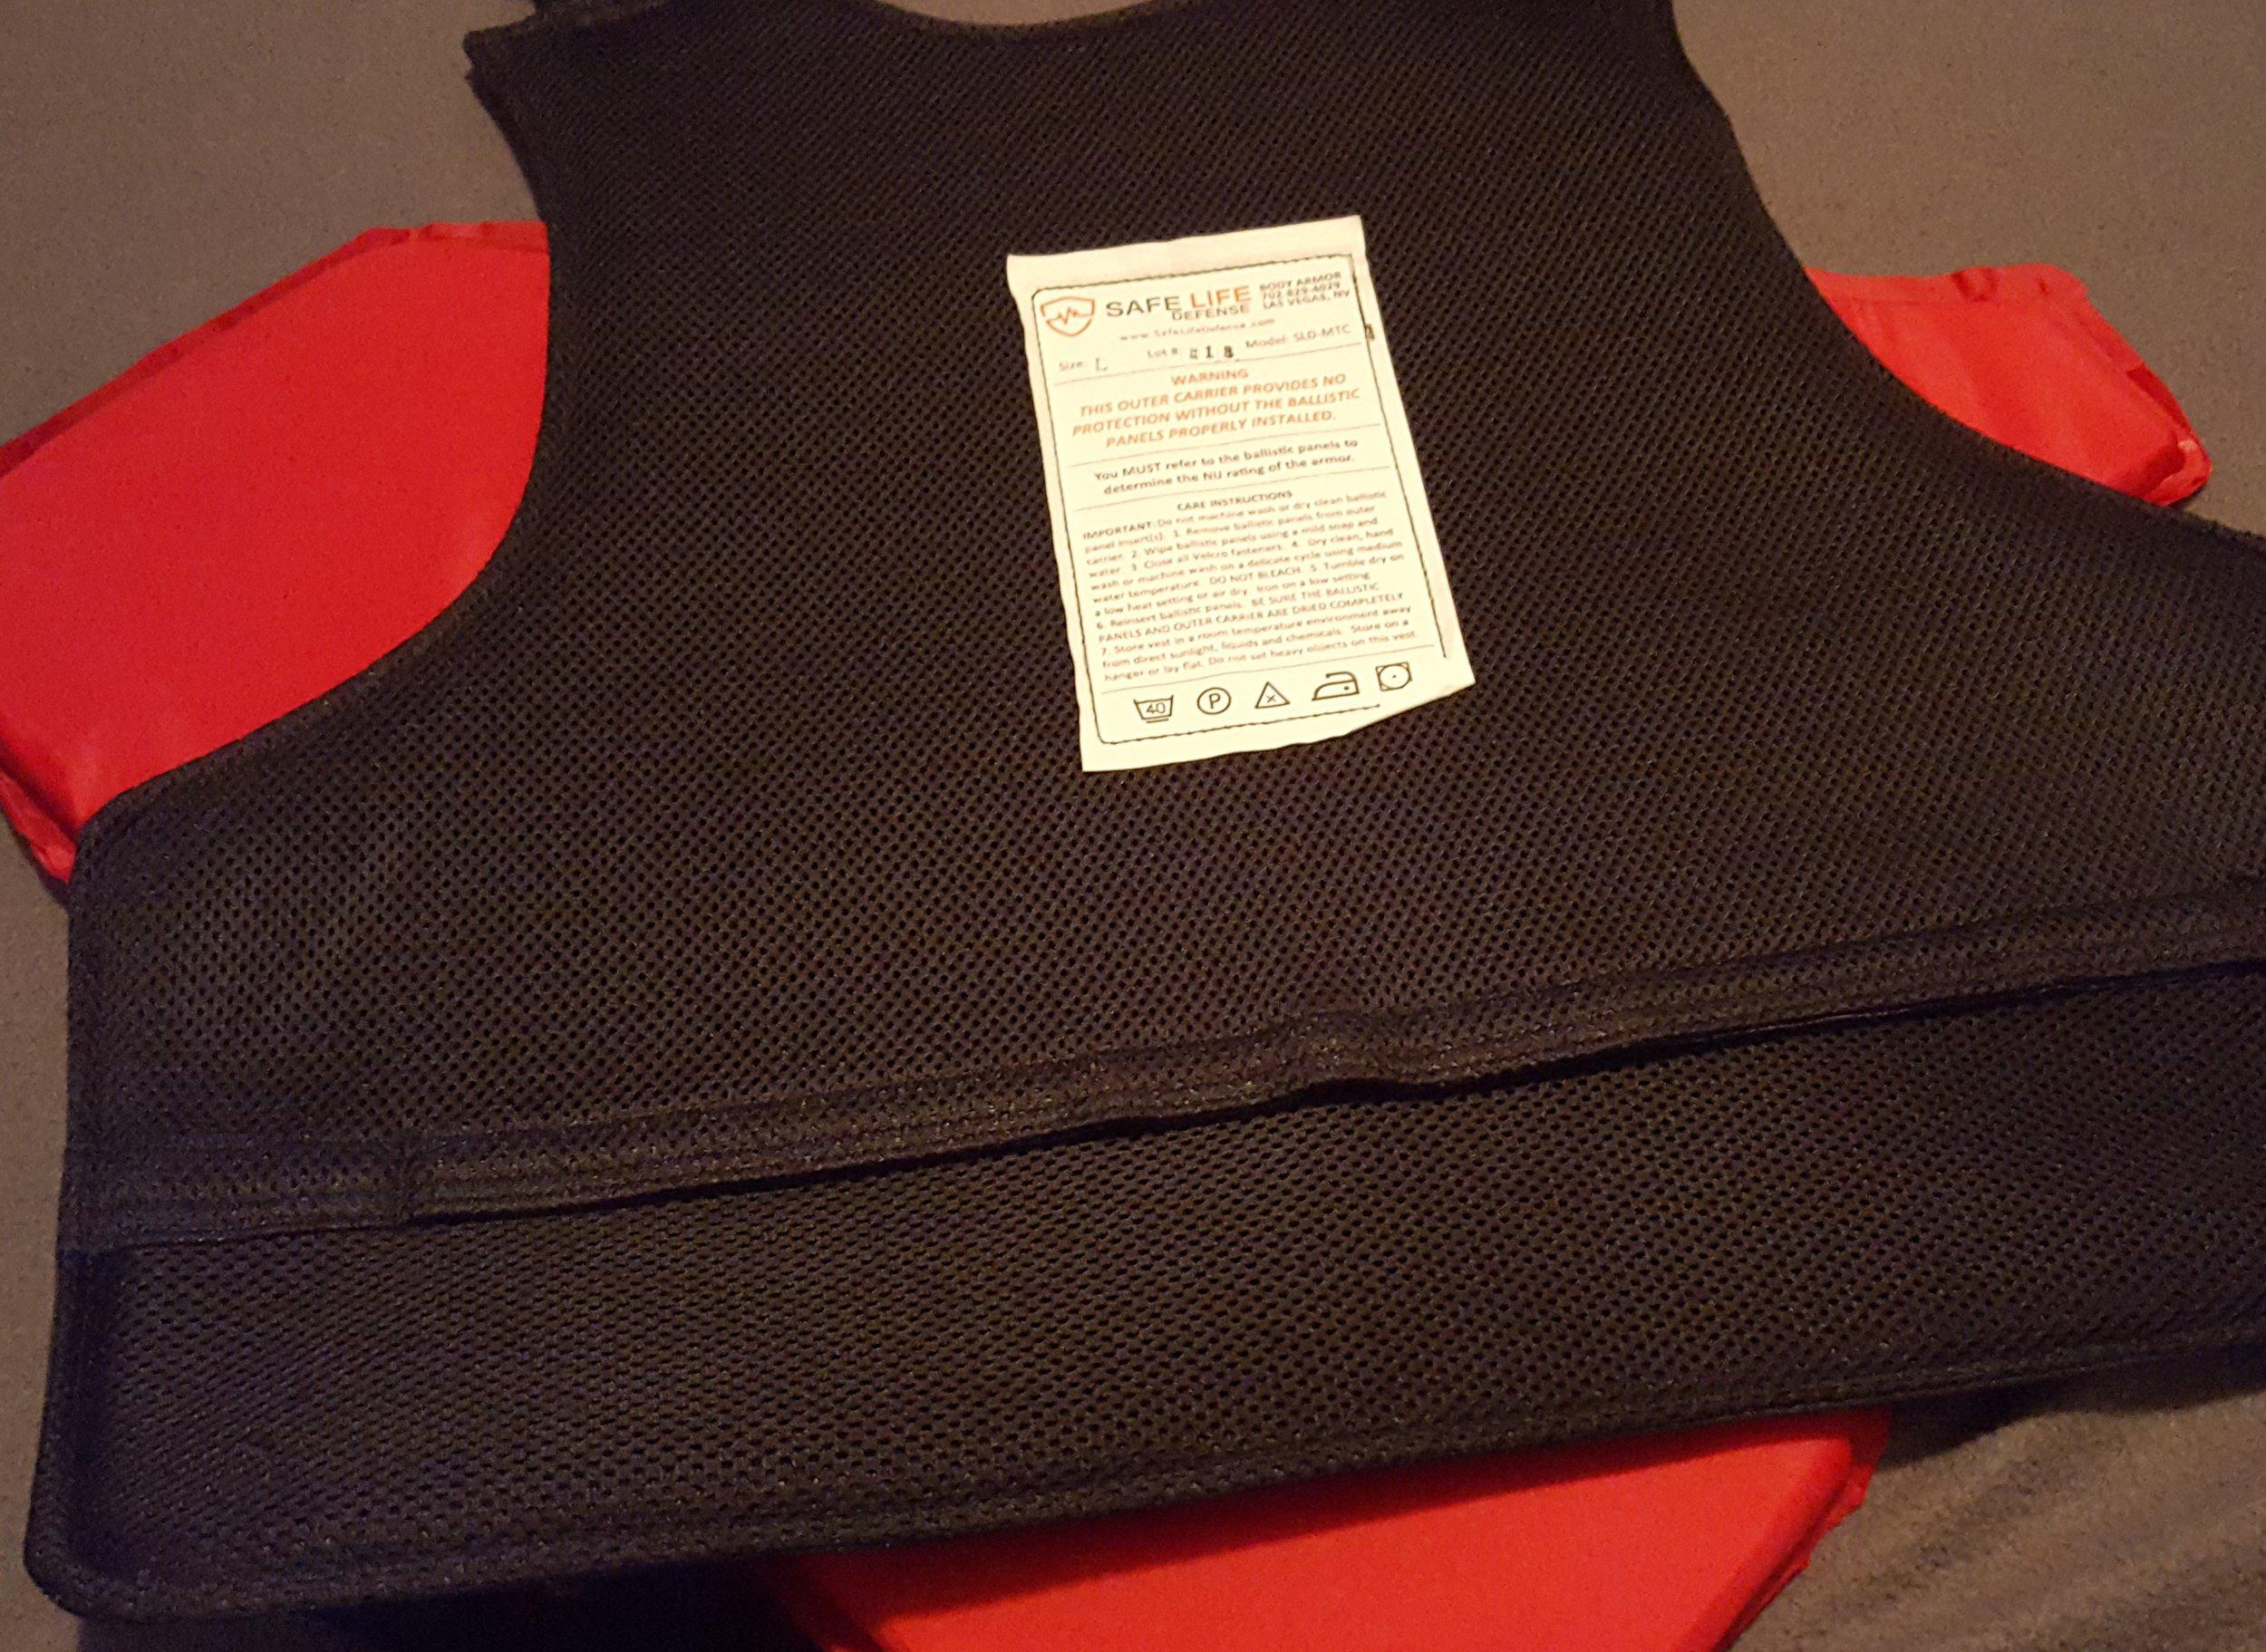 Inside of vest on top of ballistic panel